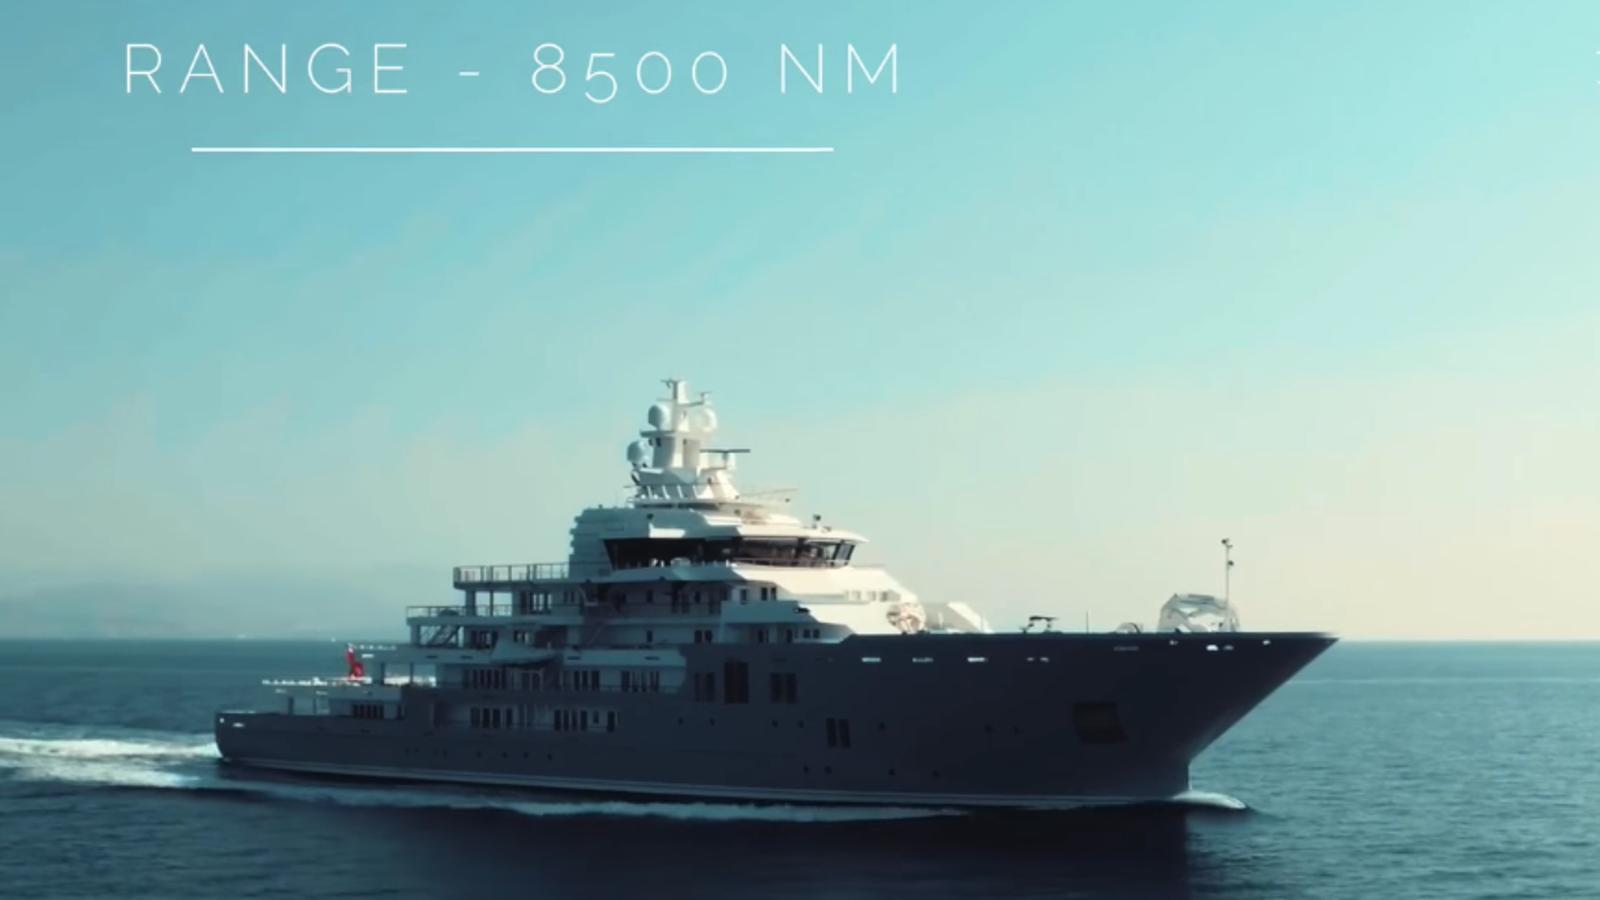 Nope It Looks Like Zuckerberg Bought No Yacht Corrected